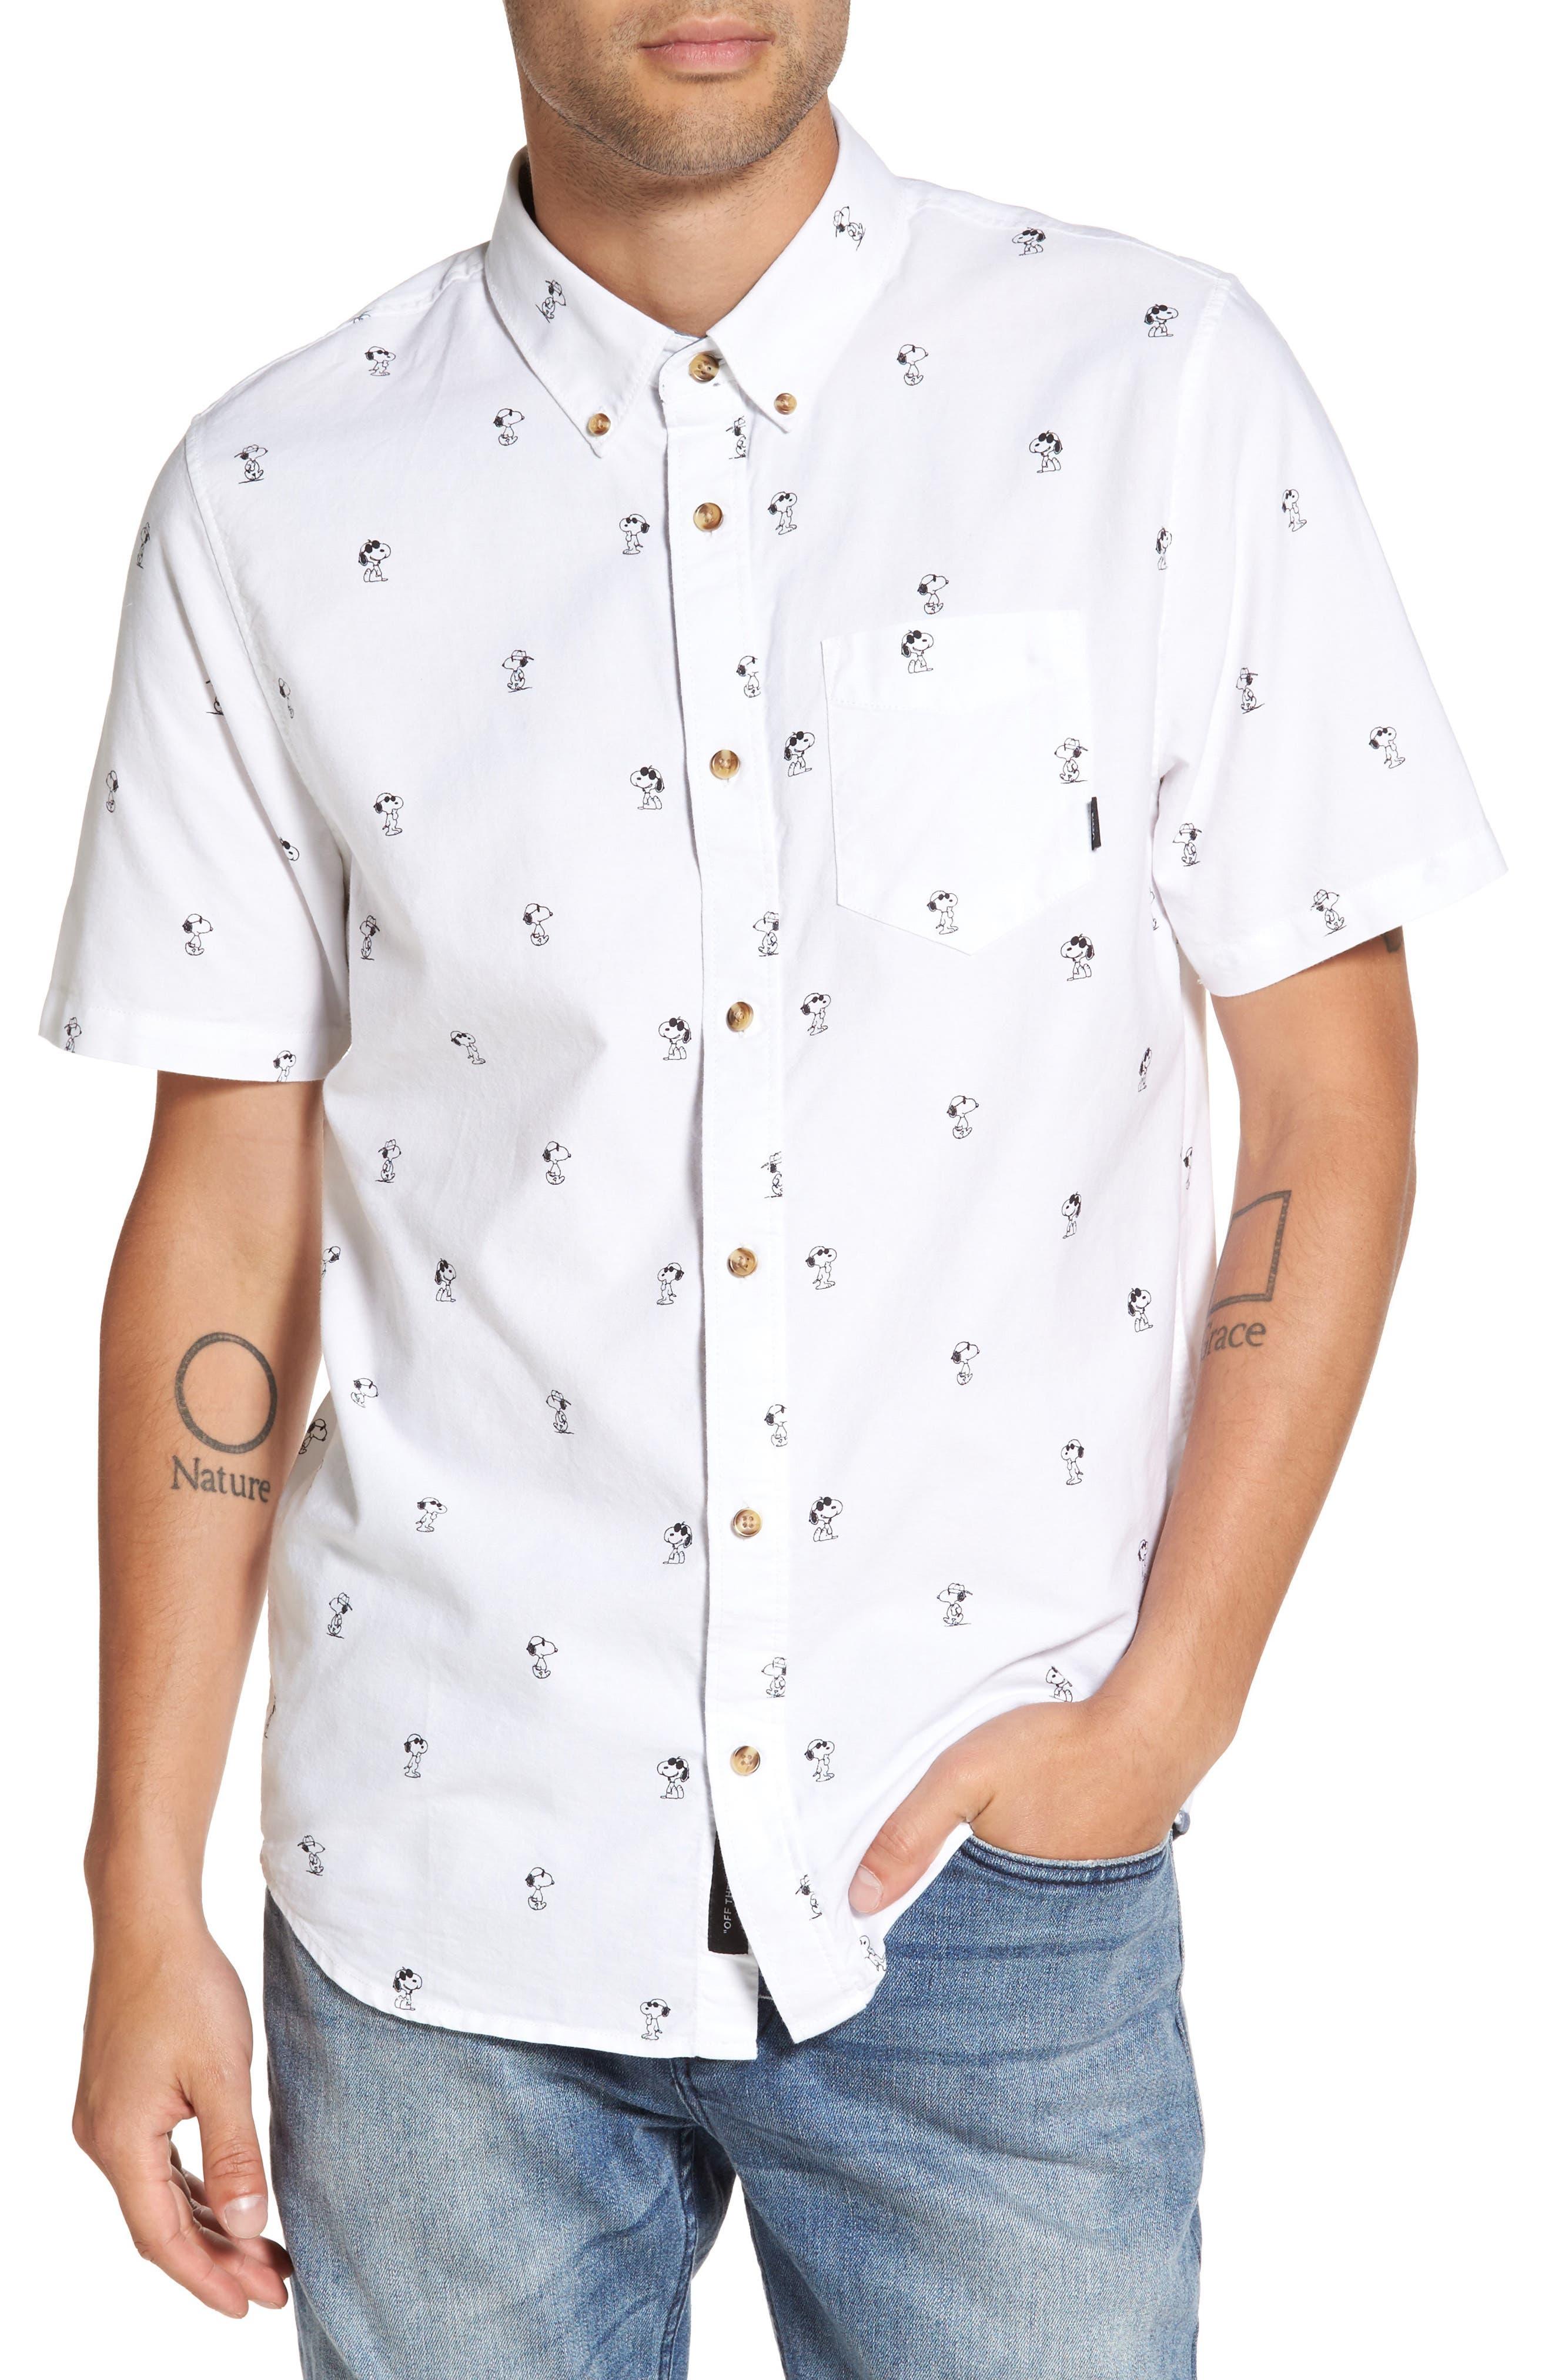 Vans x Peanuts Houser Snoopy Print Woven Shirt